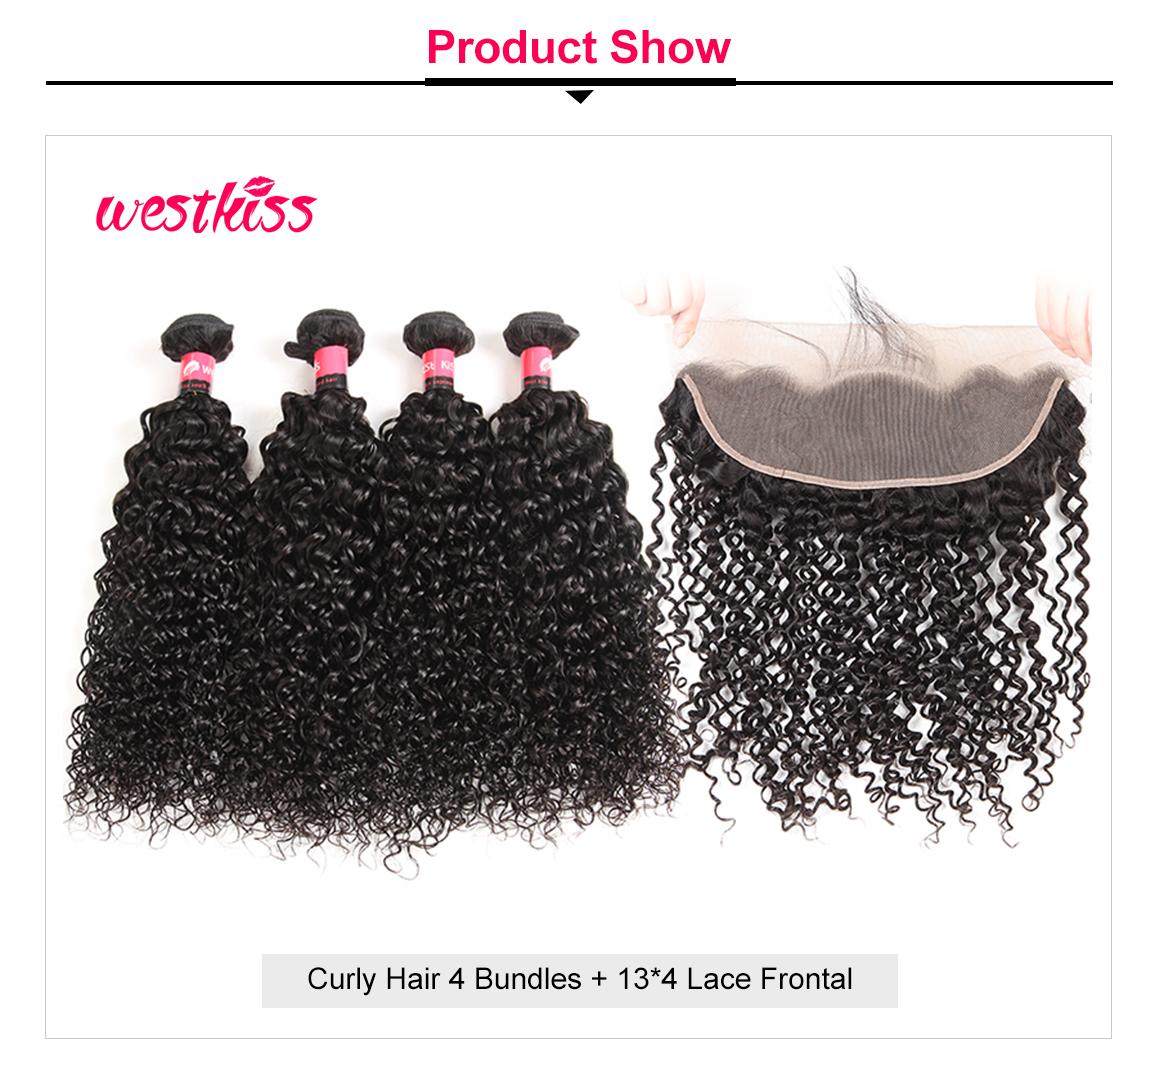 Curly Wave 4 Bundles